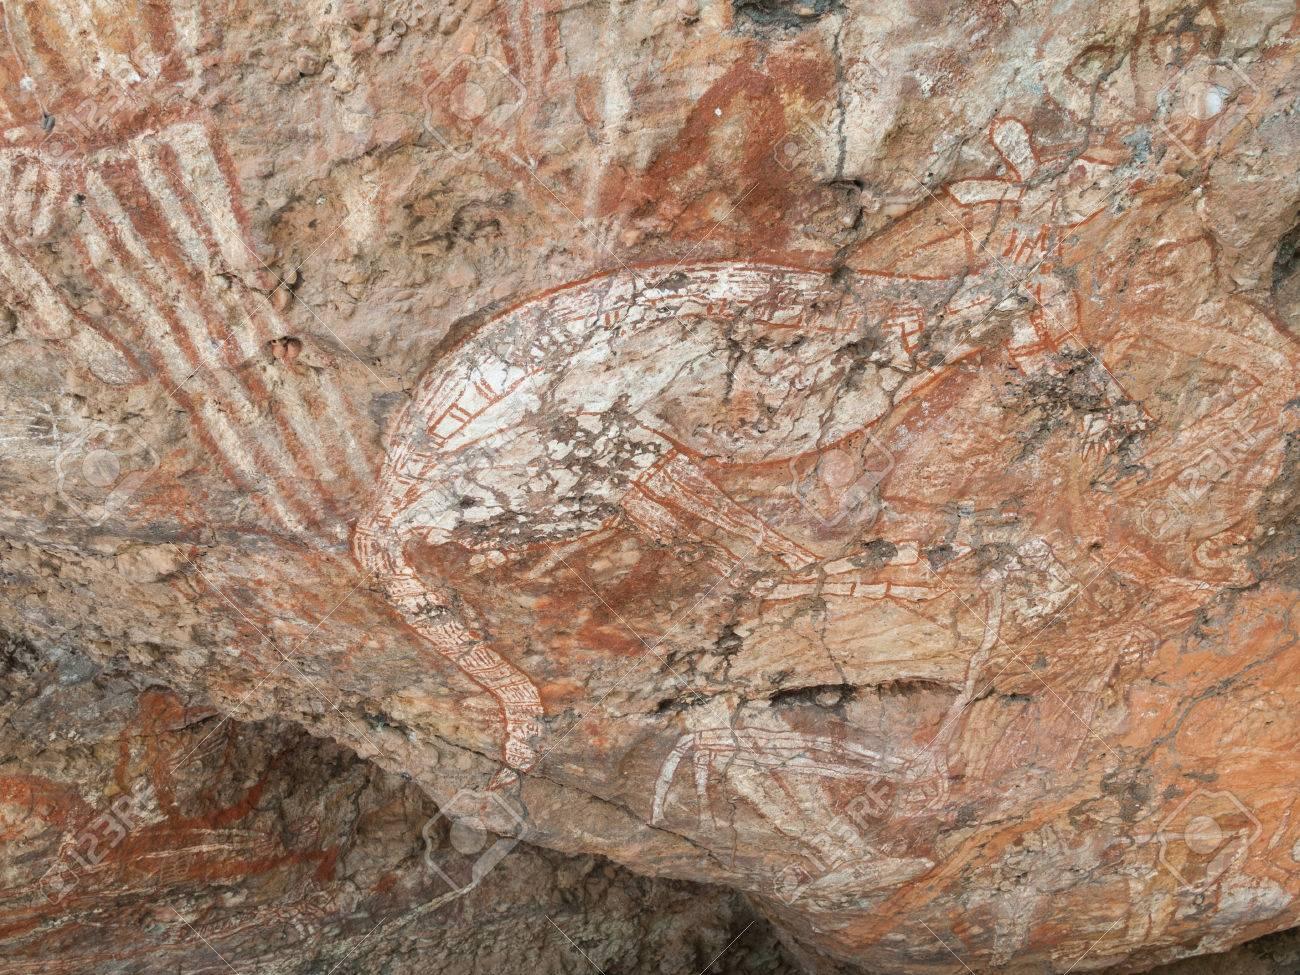 Kakadu Western Australia 06102013 Aboriginal Rock Art In